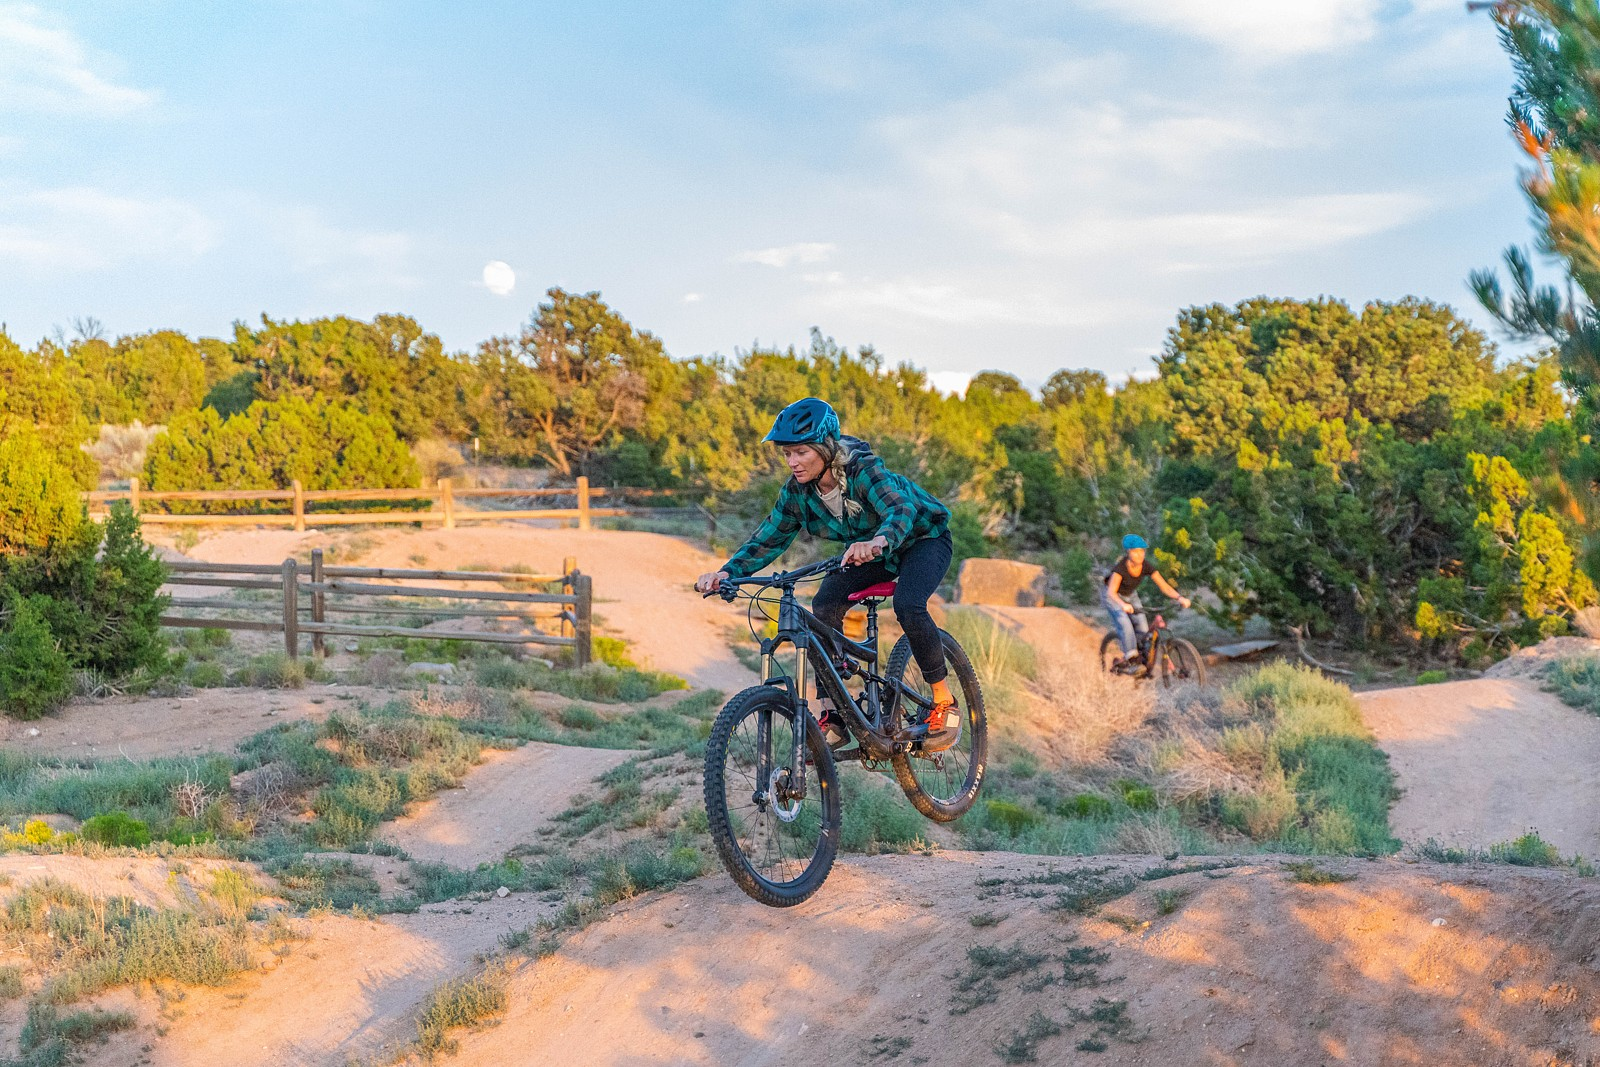 Bre sighting a landing - legpwr - Mountain Biking Pictures - Vital MTB